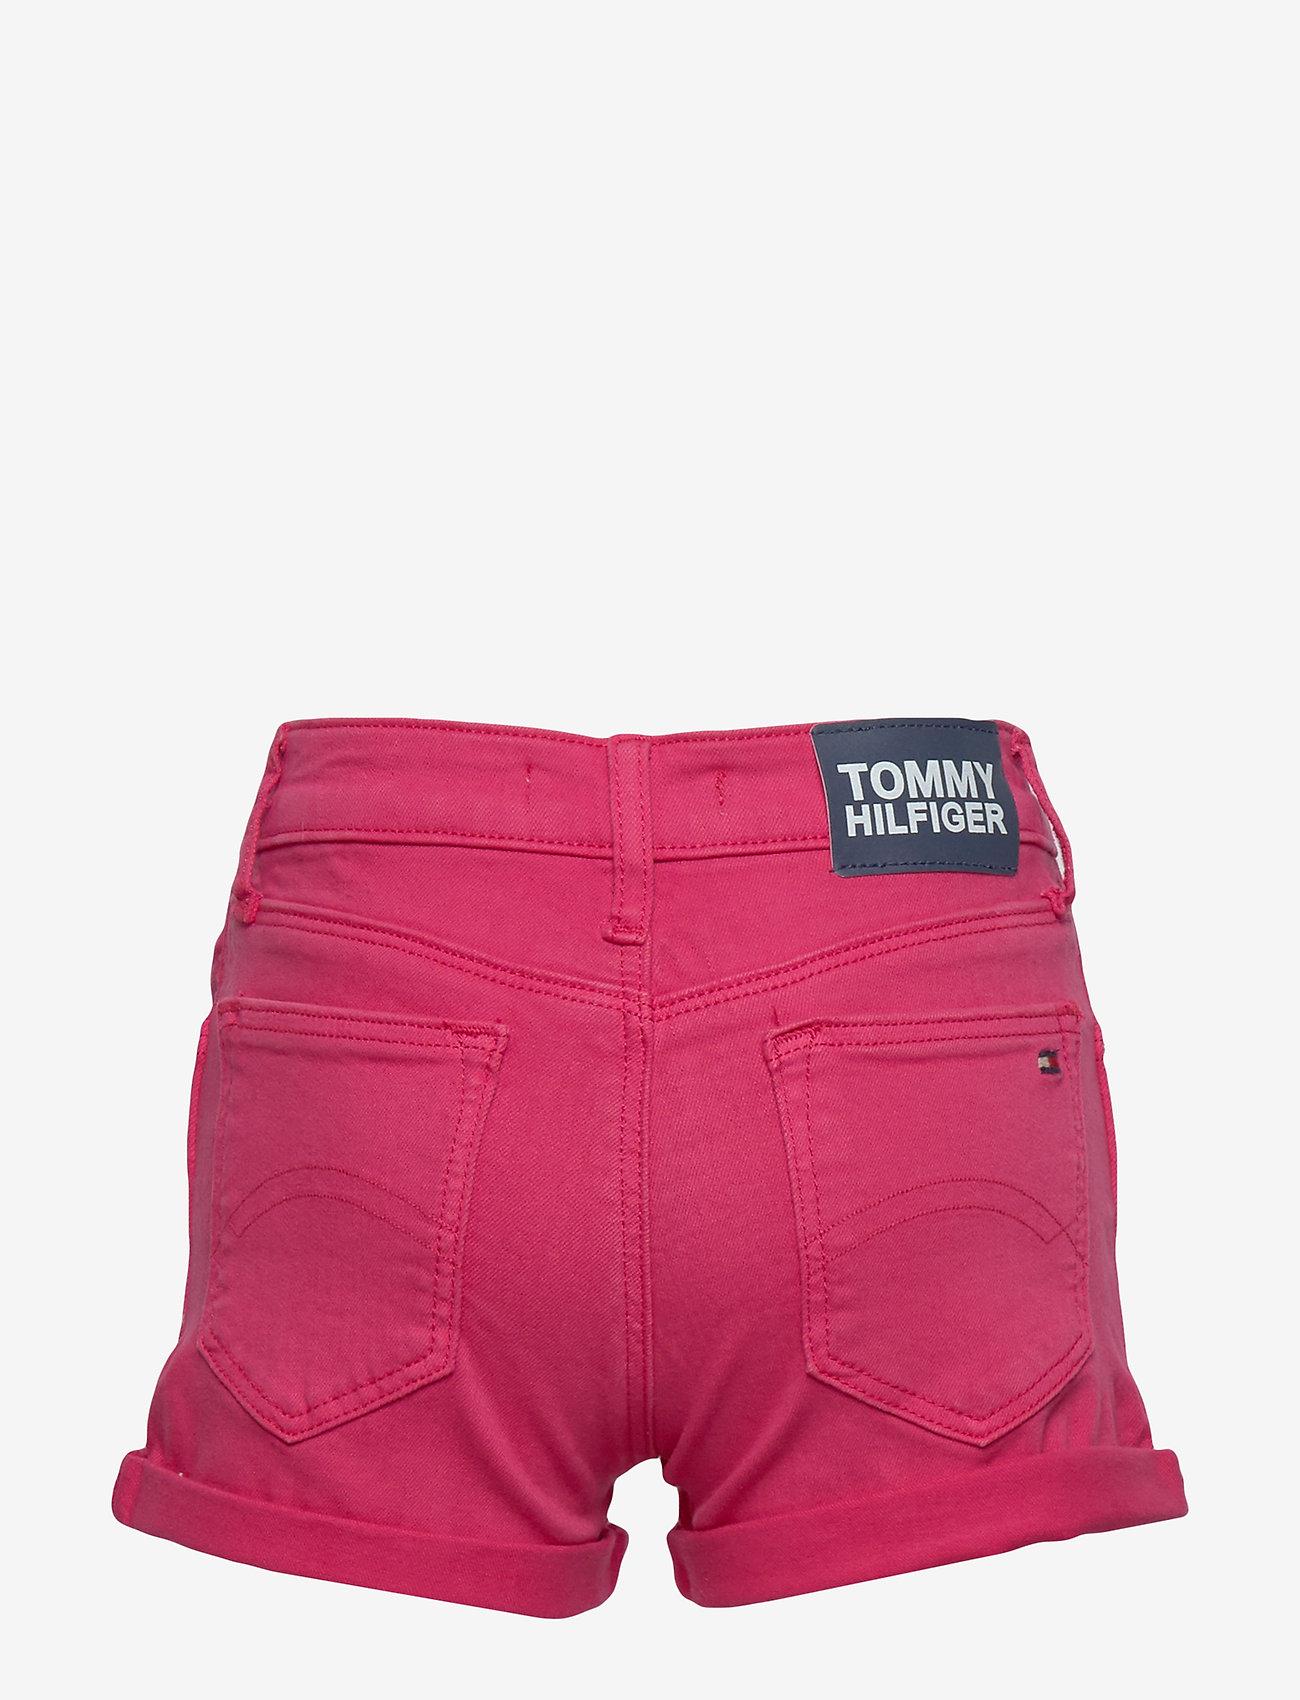 Tommy Hilfiger - NORA SHORT SOCDST - shorts - blush red - 1